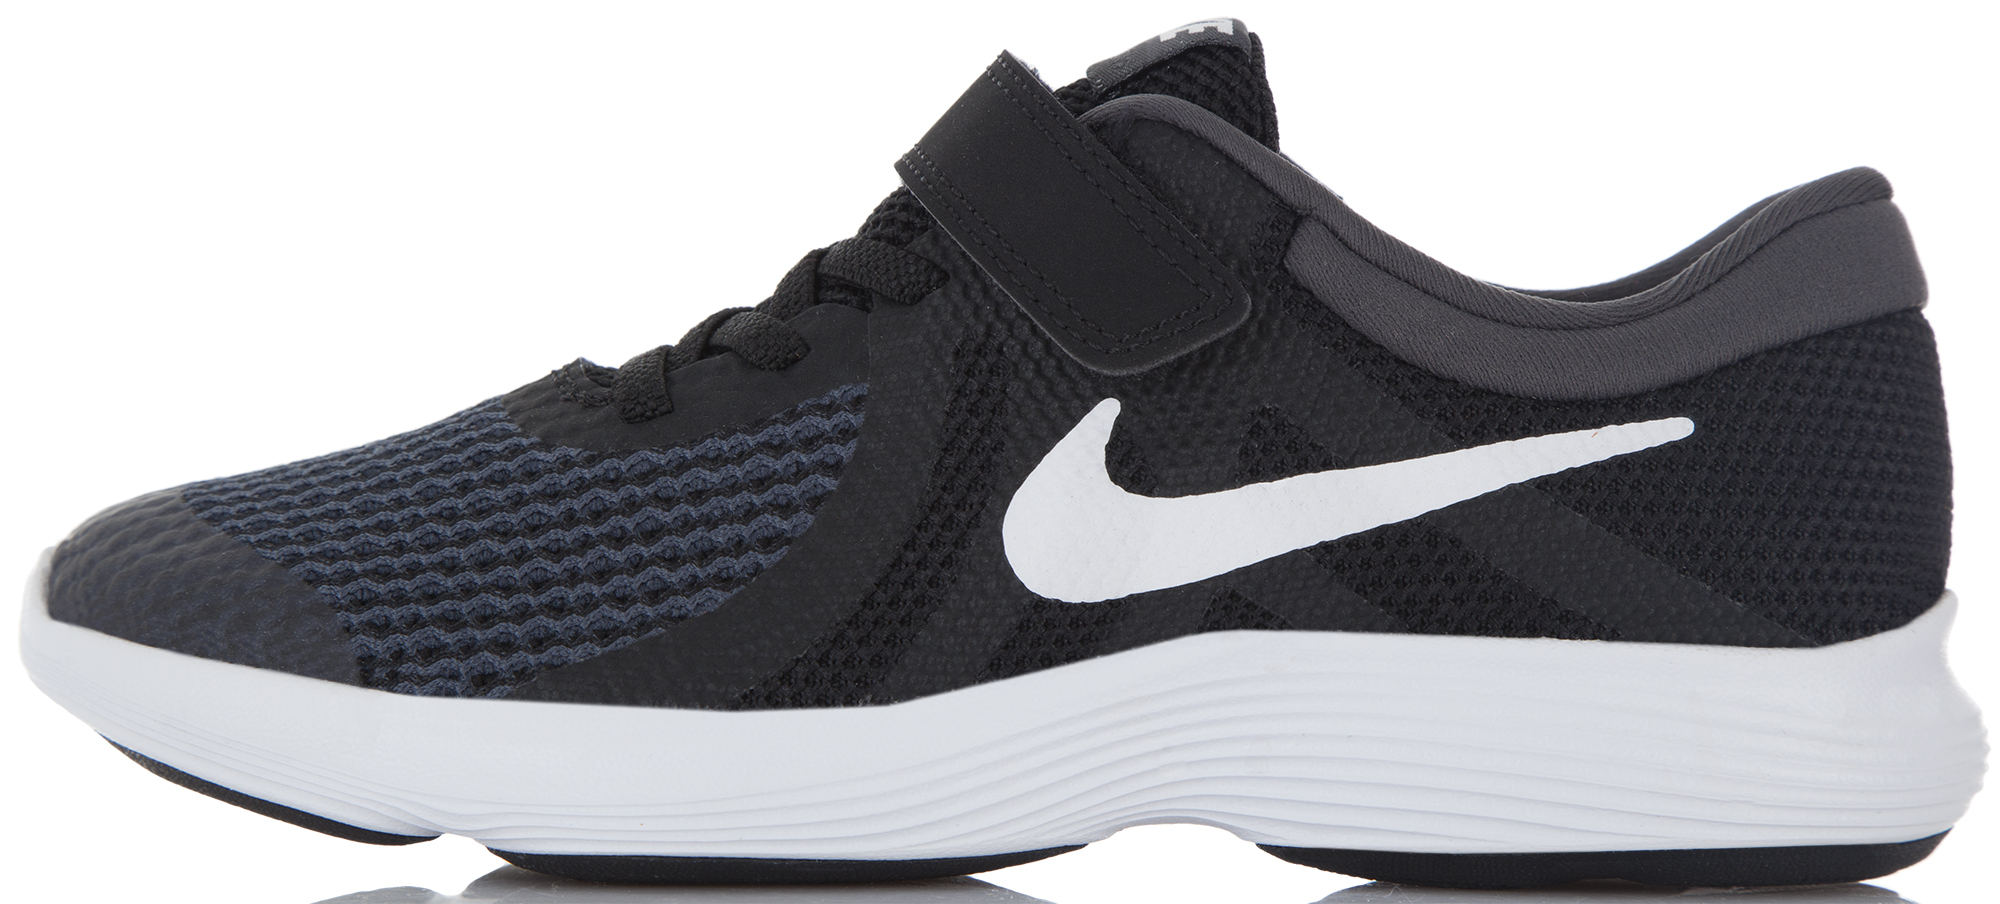 Nike Кроссовки для мальчиков Nike Revolution 4